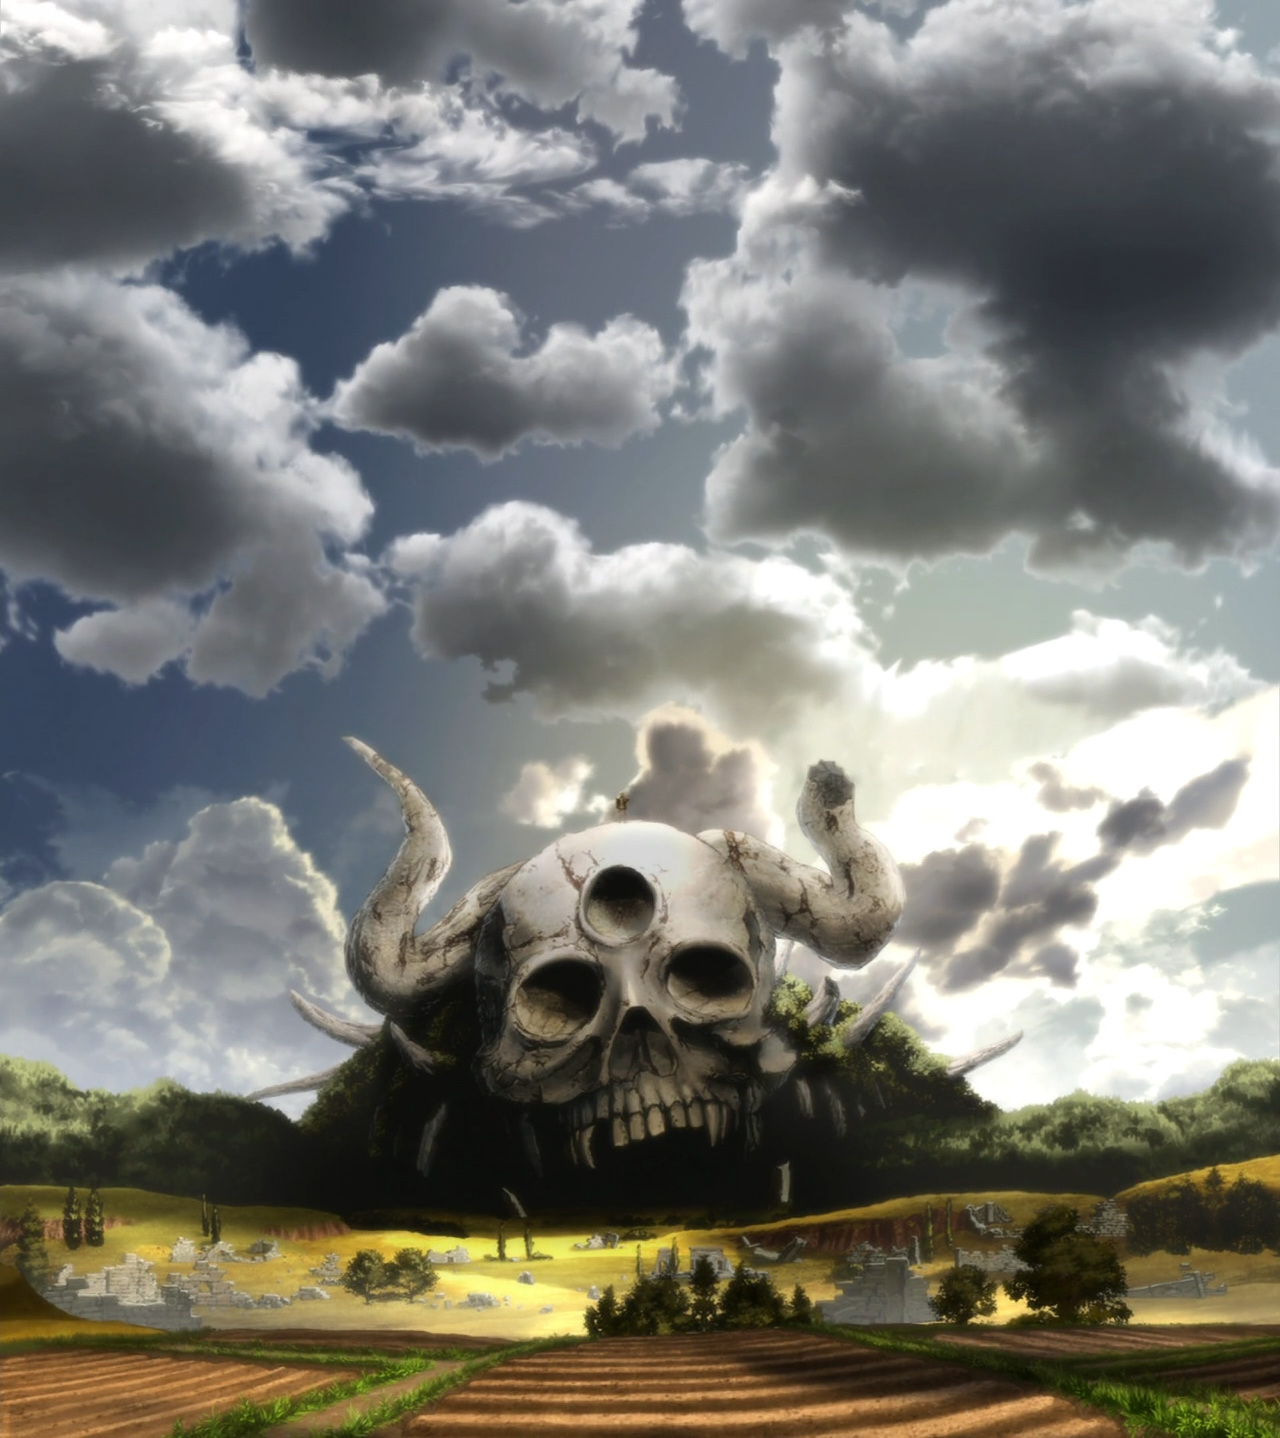 Water Animation Wallpaper Black Clover T V Media Review Episode 2 Anime Solution